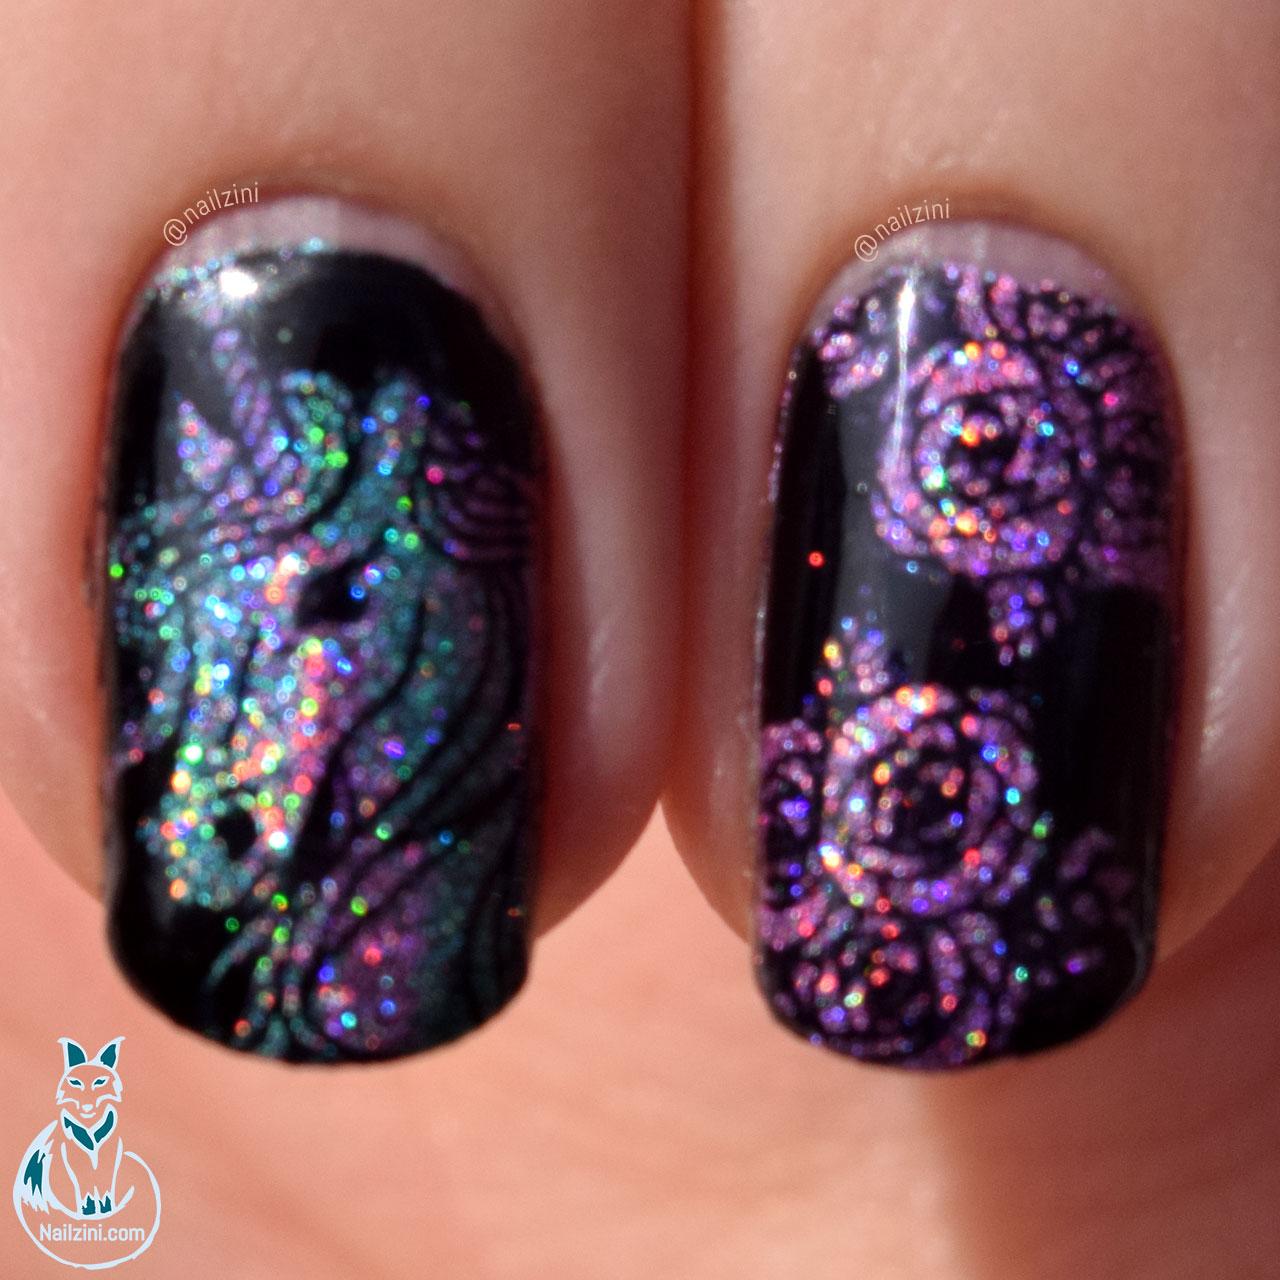 Holographic Unicorn Nail Art | Nailzini: A Nail Art Blog